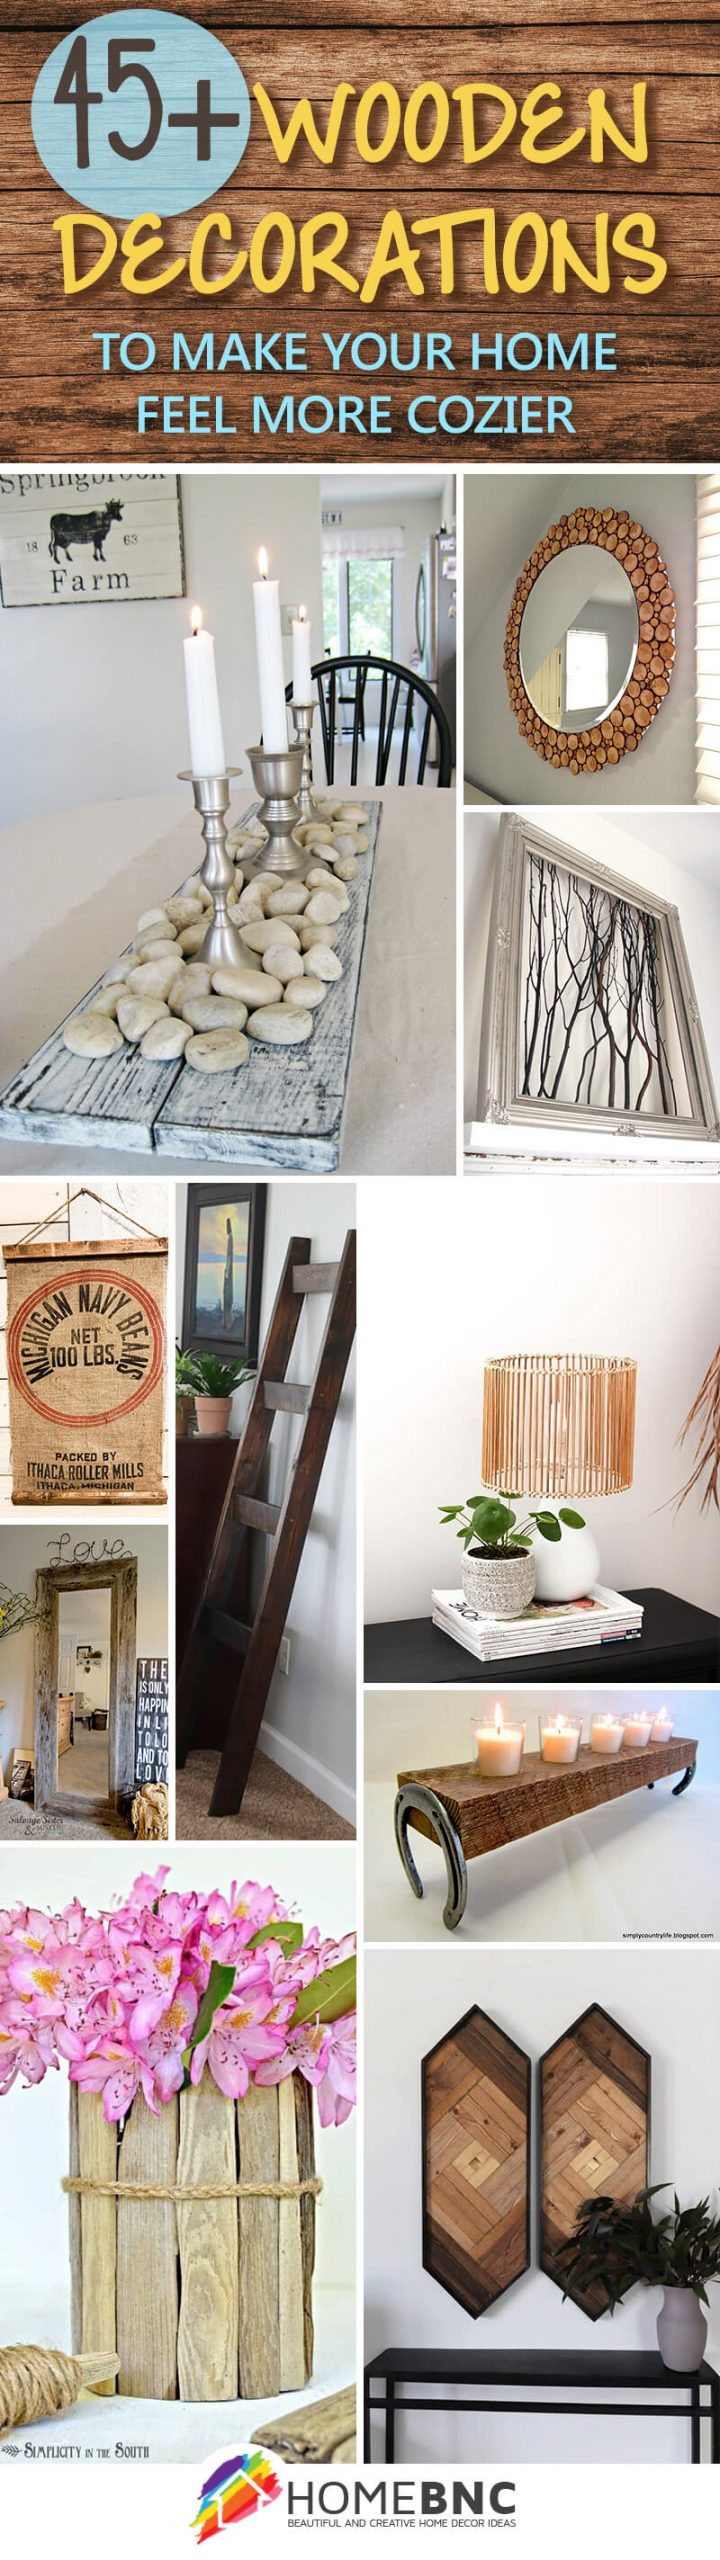 Wood Home Decorations